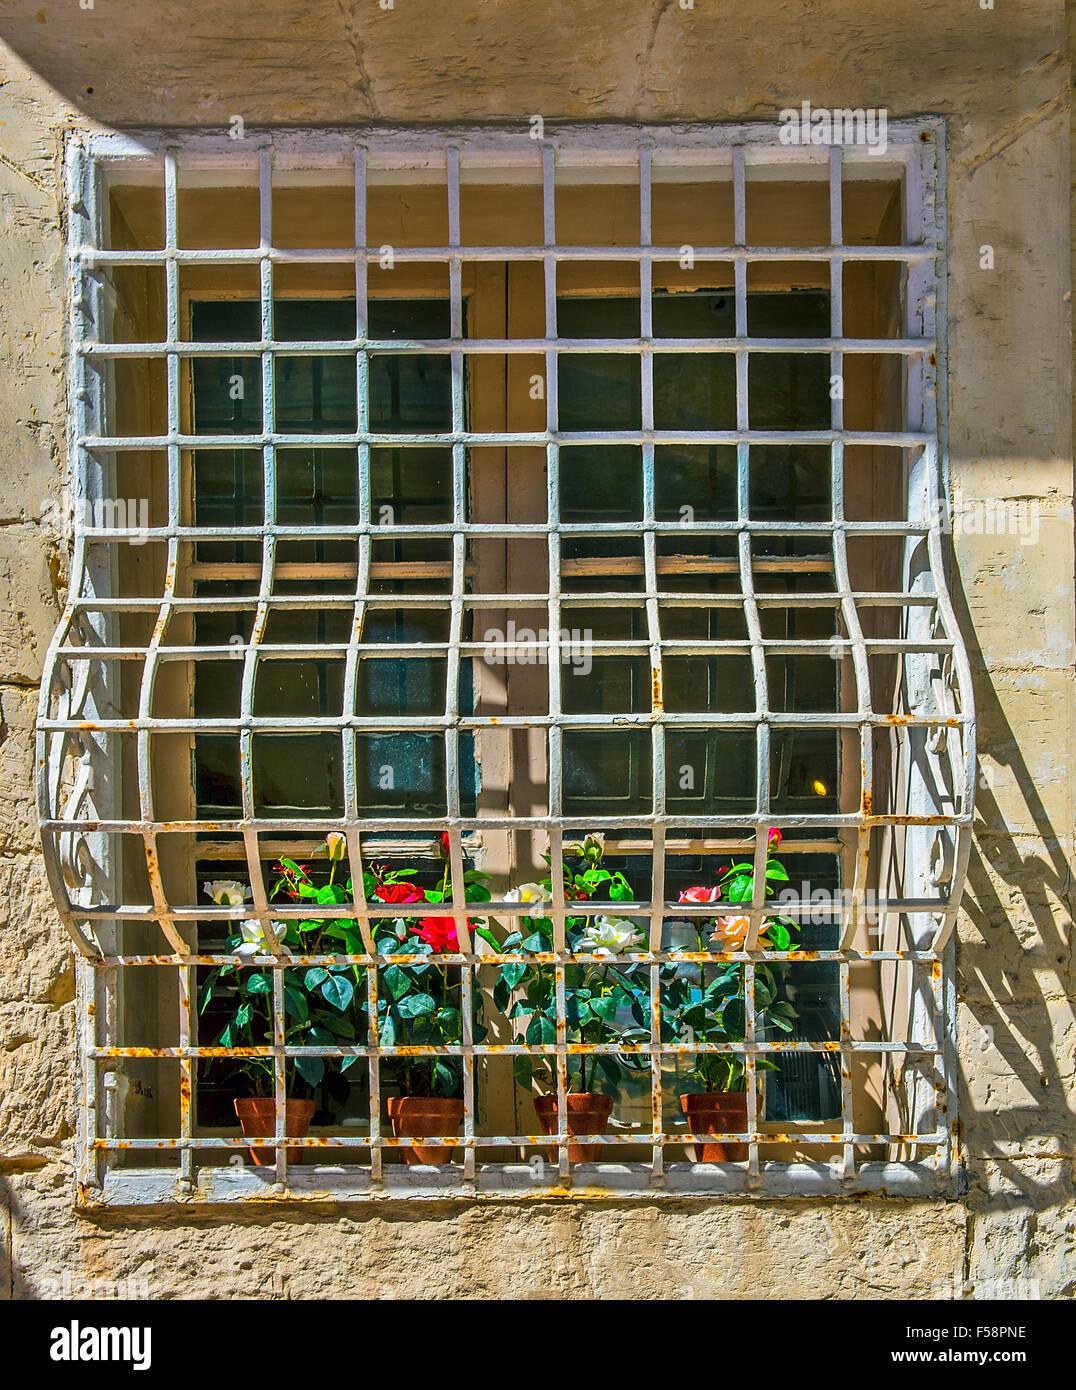 Security Bars For French Patio Doors: Burglar Bars Stock Photos & Burglar Bars Stock Images